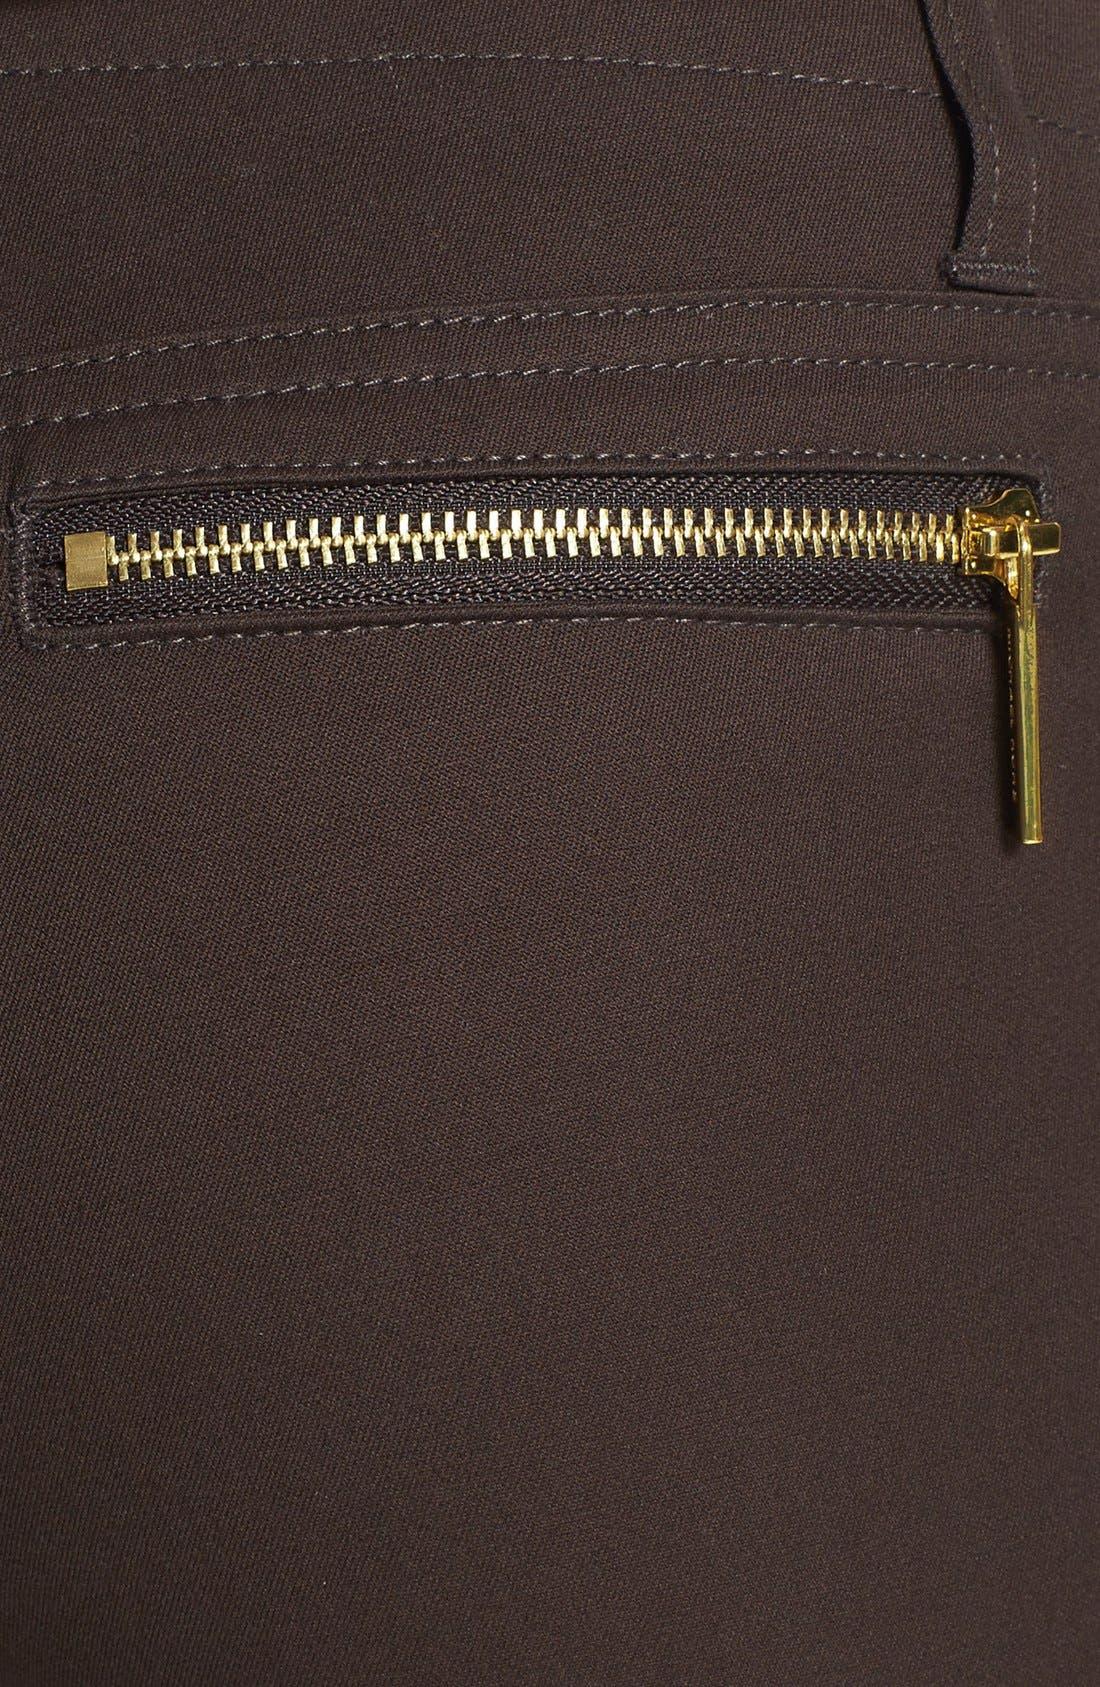 Zip Pocket Skinny Pants,                             Alternate thumbnail 5, color,                             201